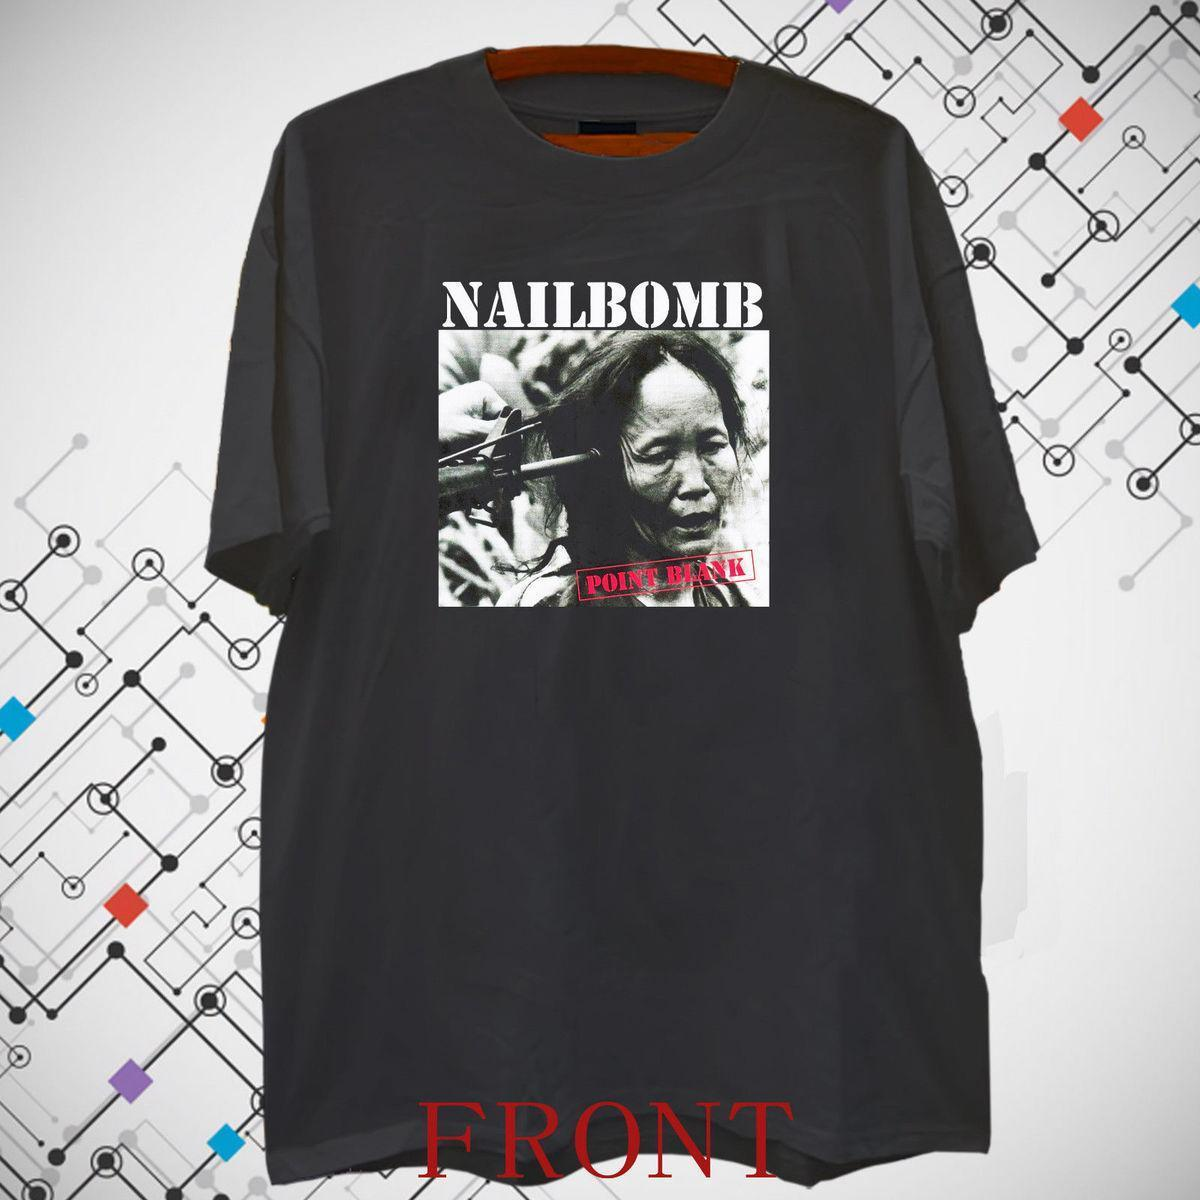 NAILBOMB POINT BLANK 94 SEPULTURA Men s Black T shirt Tee S-3XL Short  Sleeve Plus Size t-shirt colour jurney Print t shirt